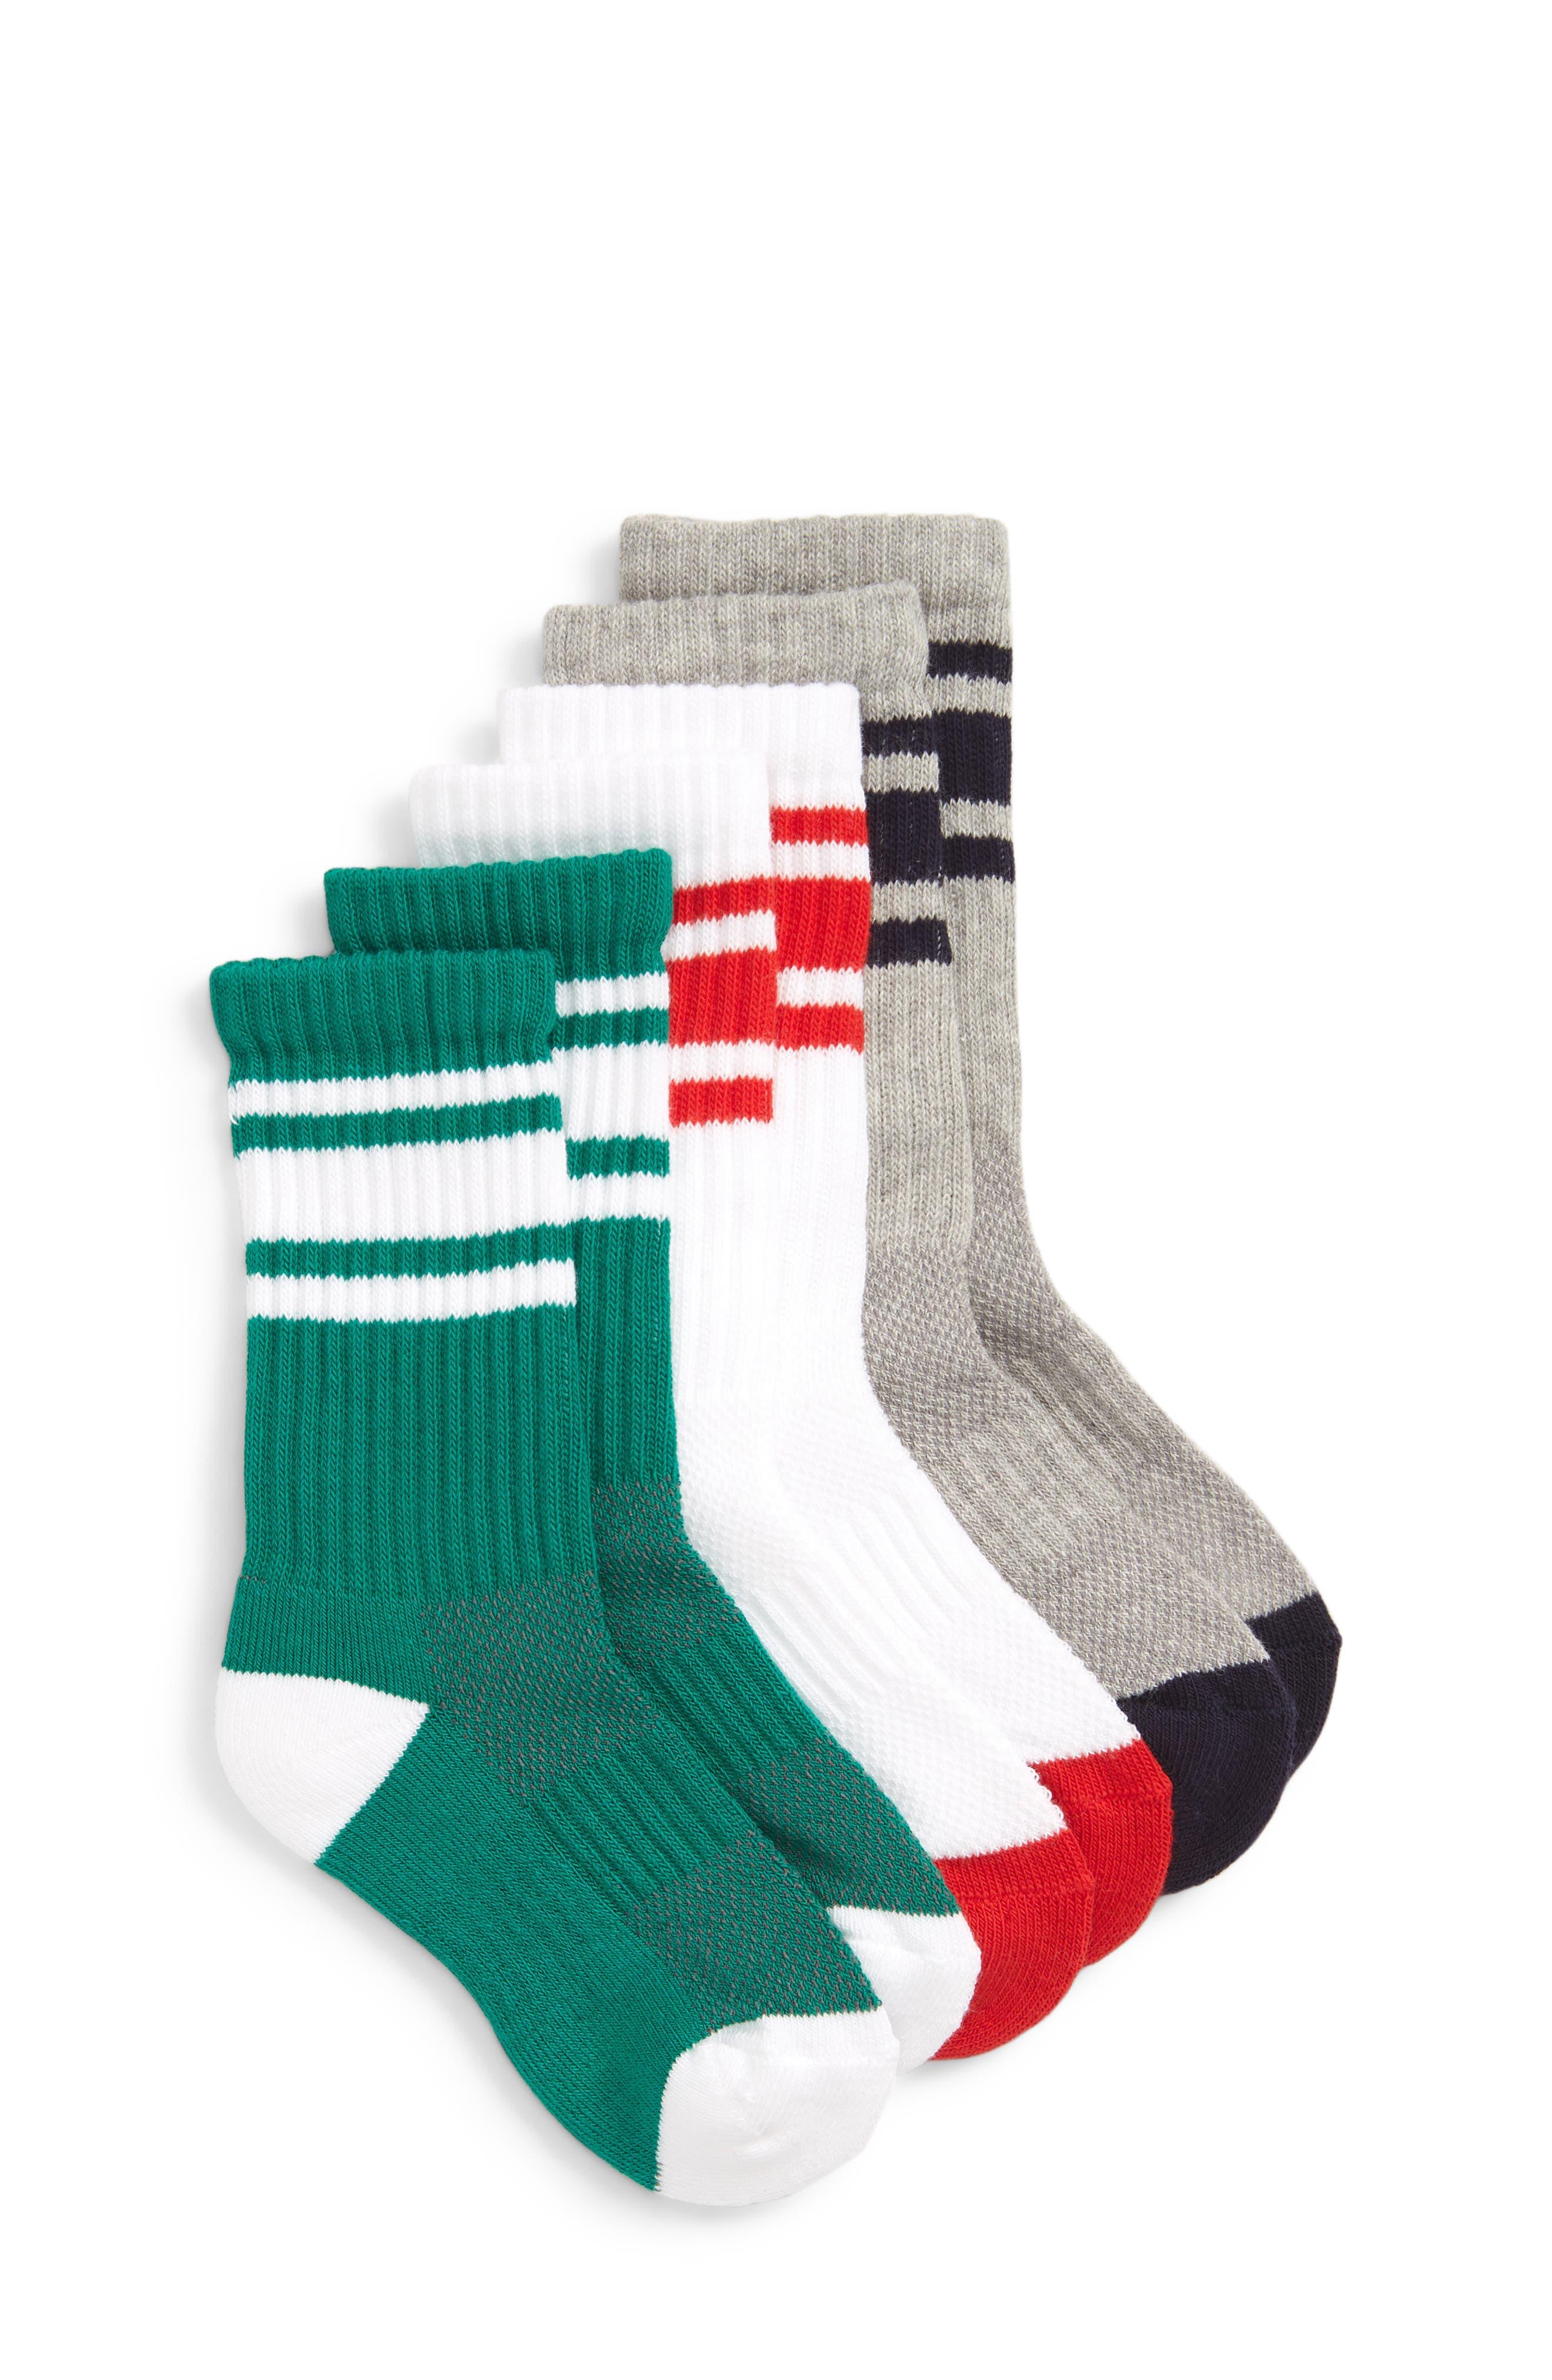 TUCKER + TATE 3-Pack Tube Socks, Main, color, 420